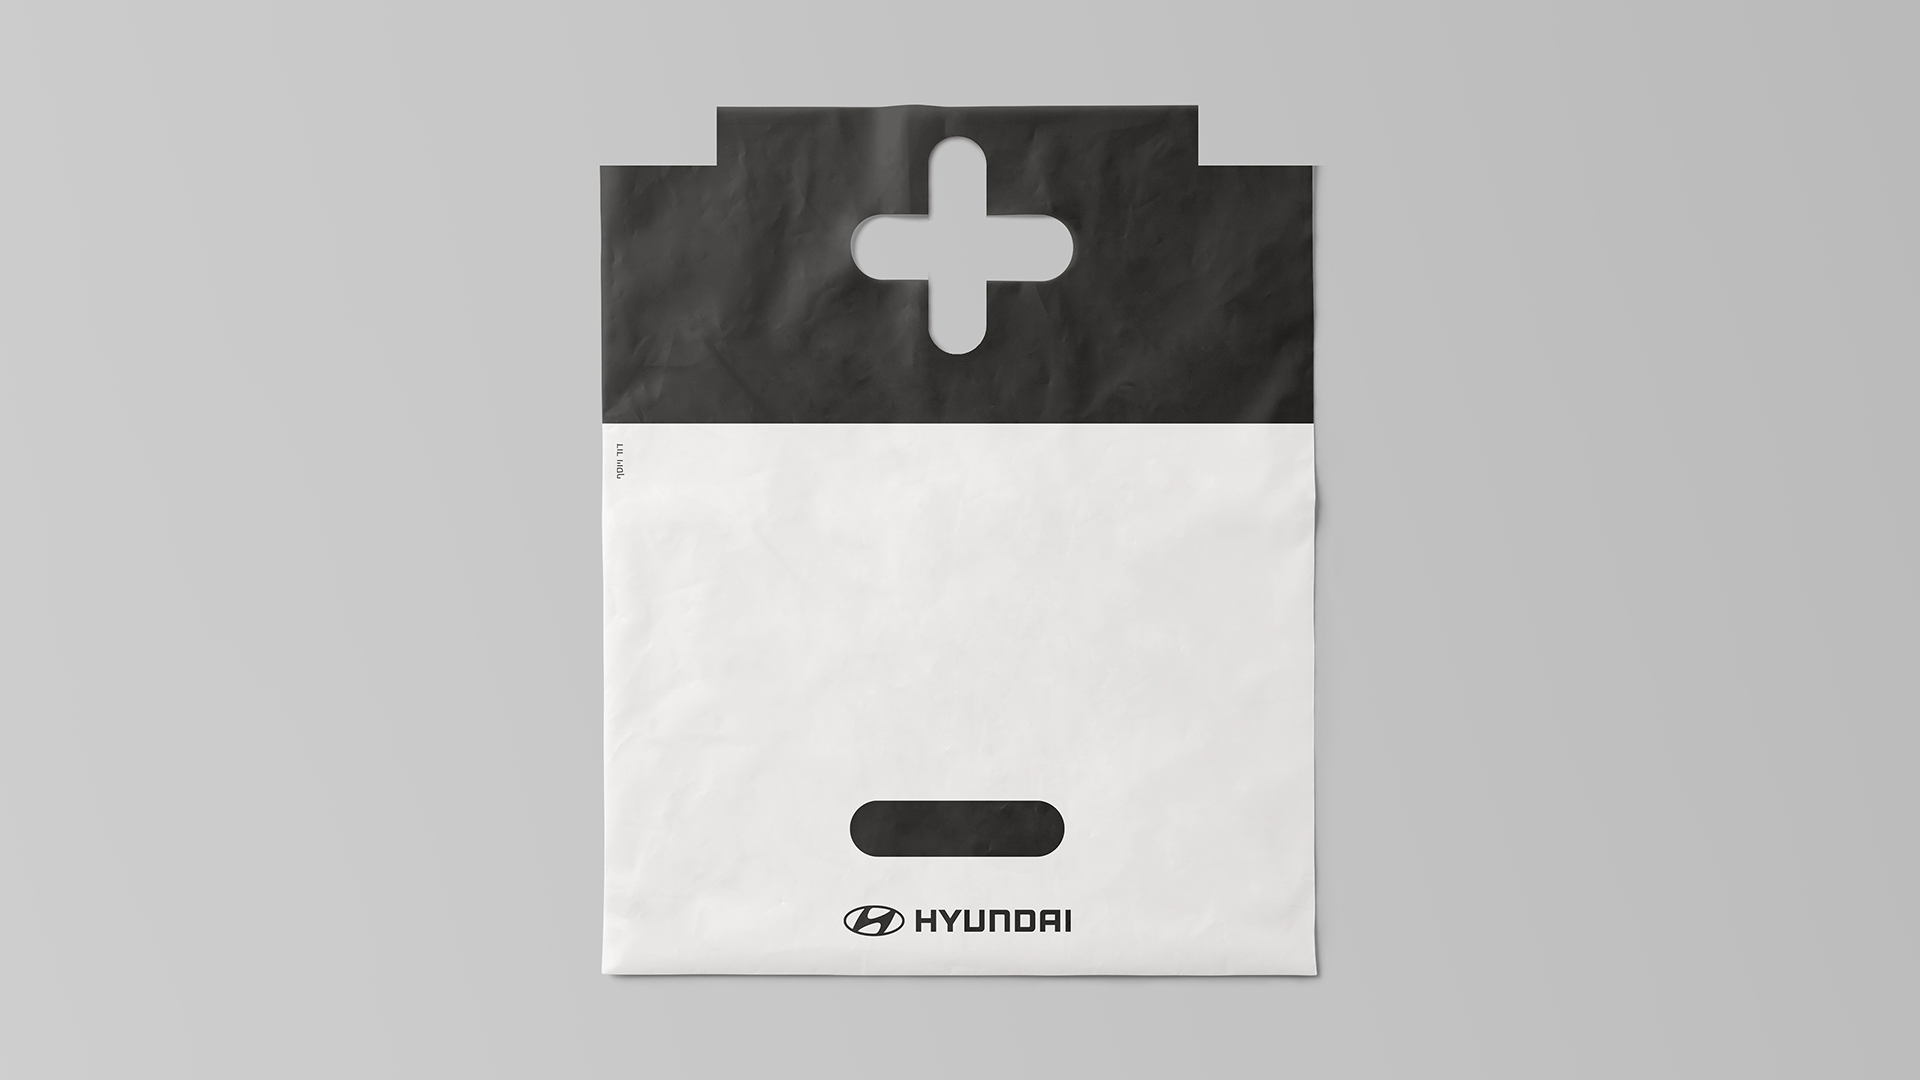 Hyundai bag design